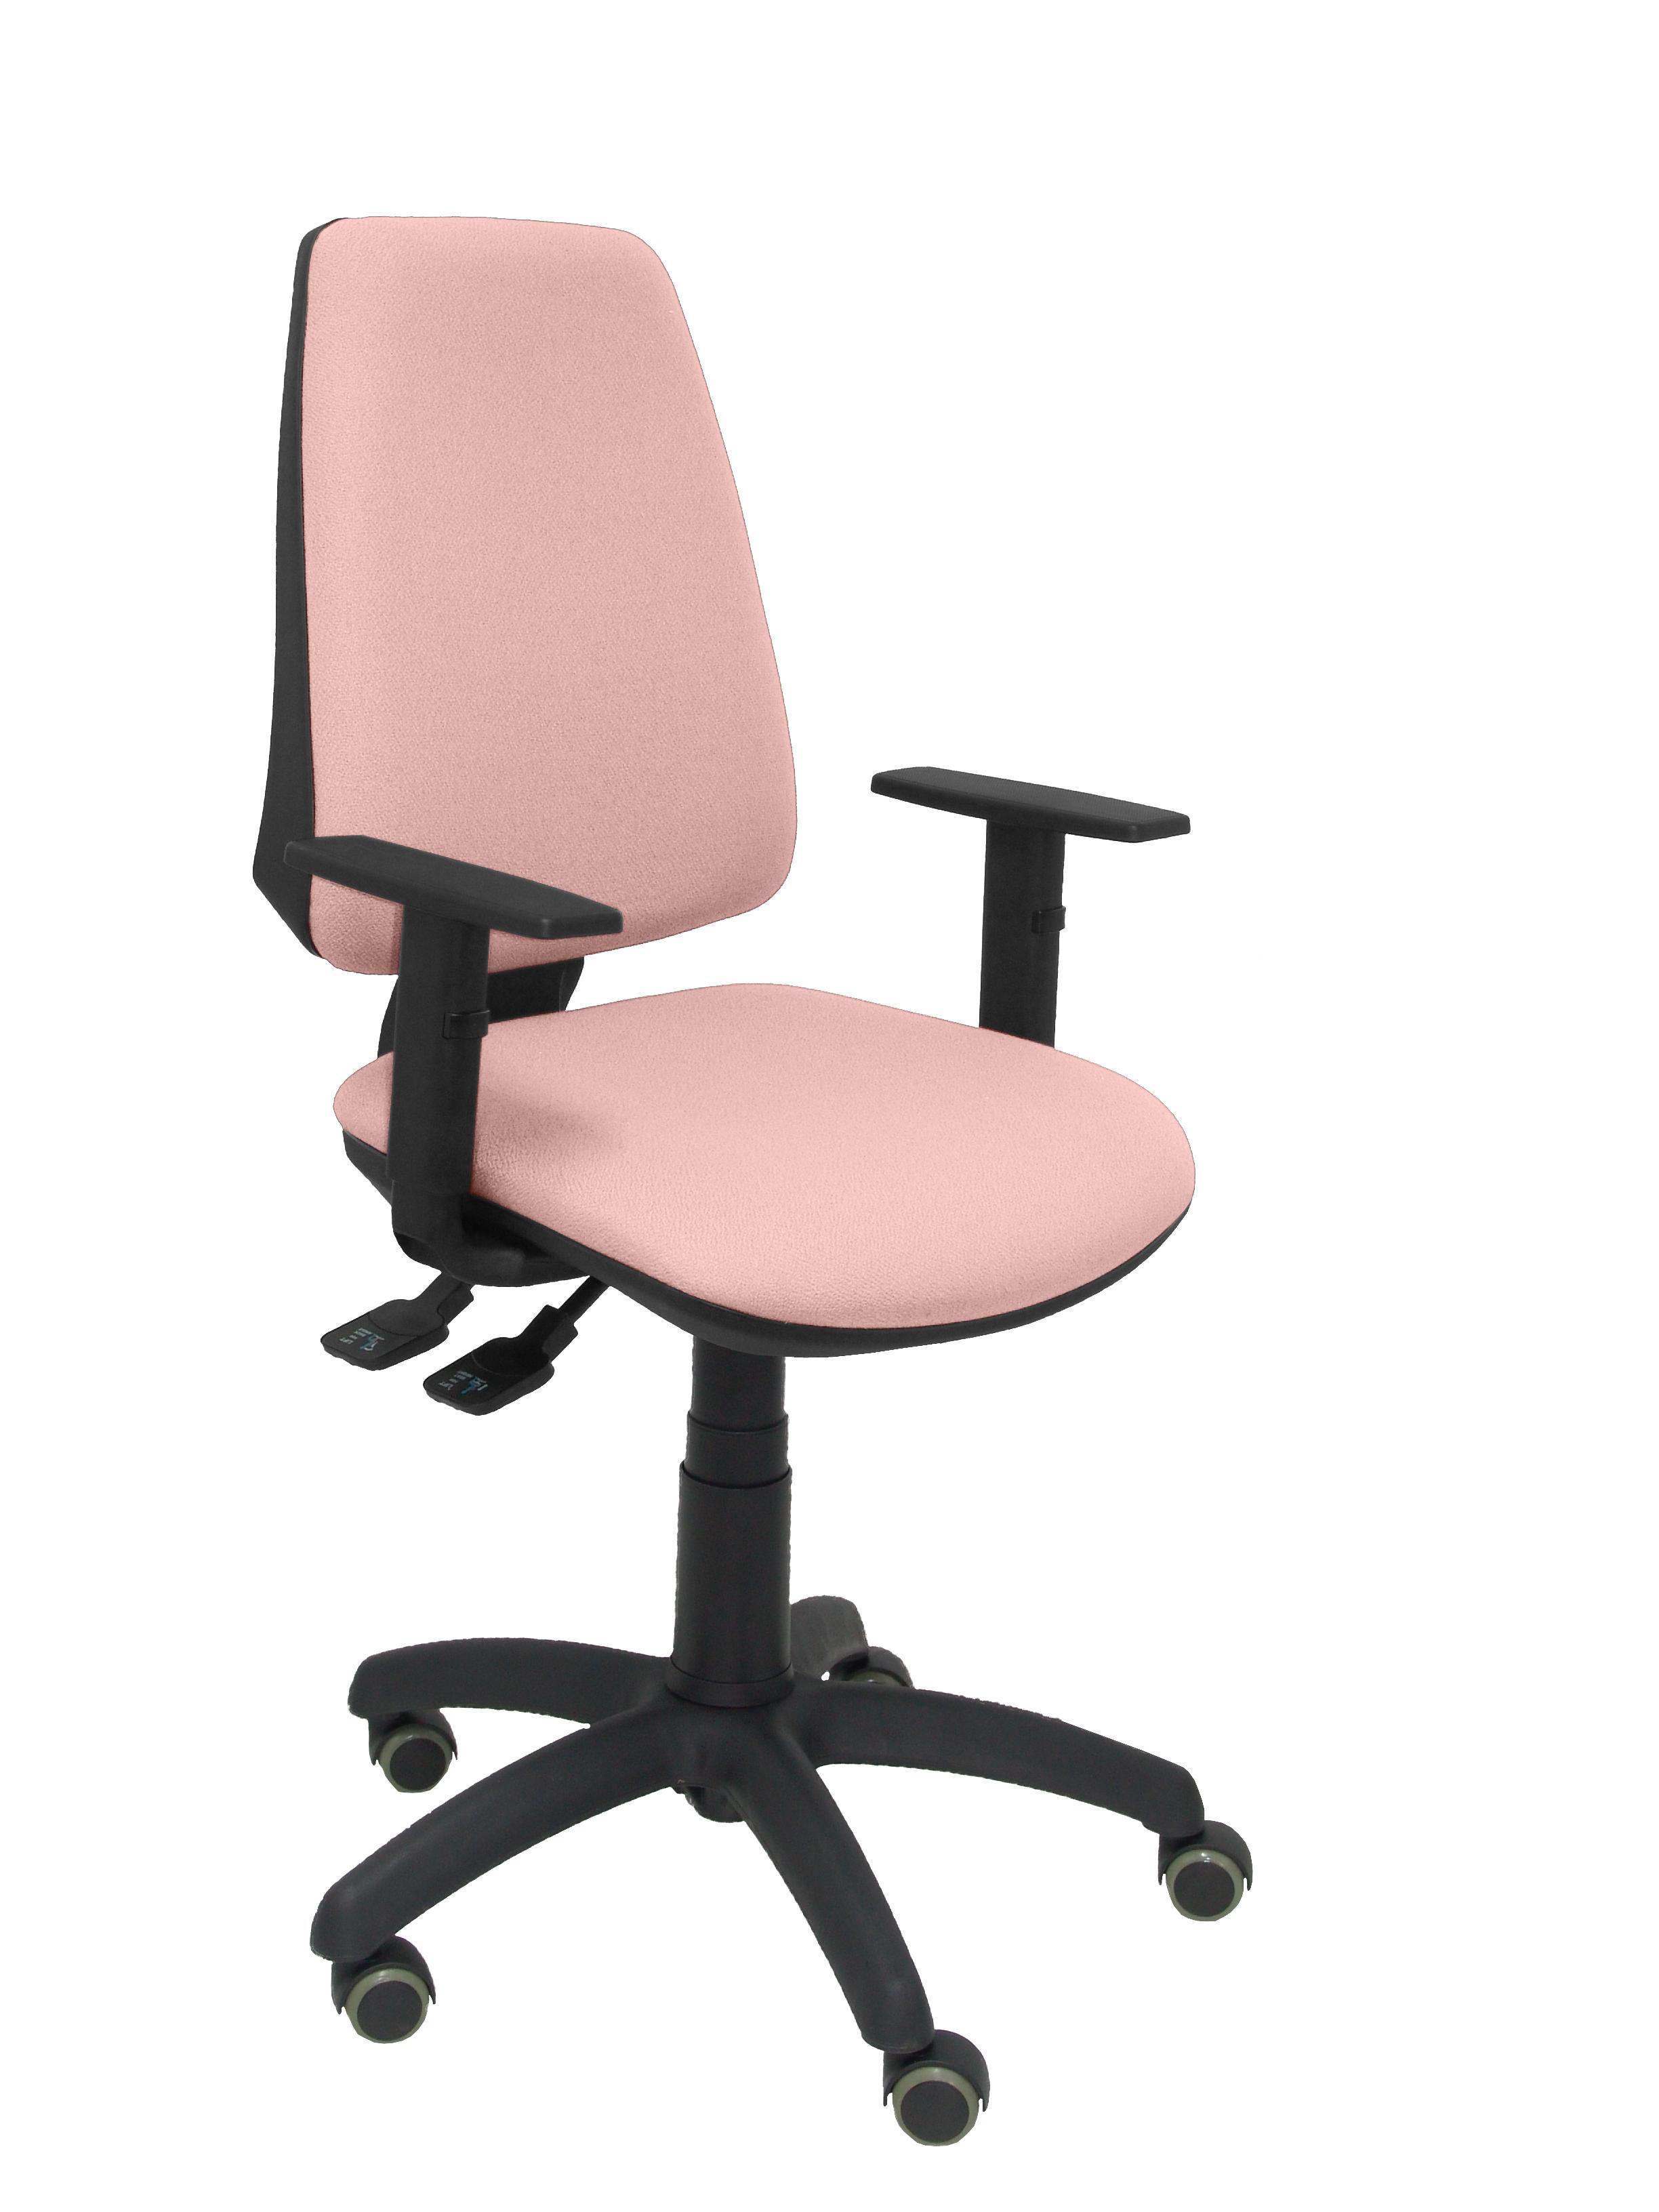 Silla Elche S bali rosa pálido brazos regulables ruedas de parquet